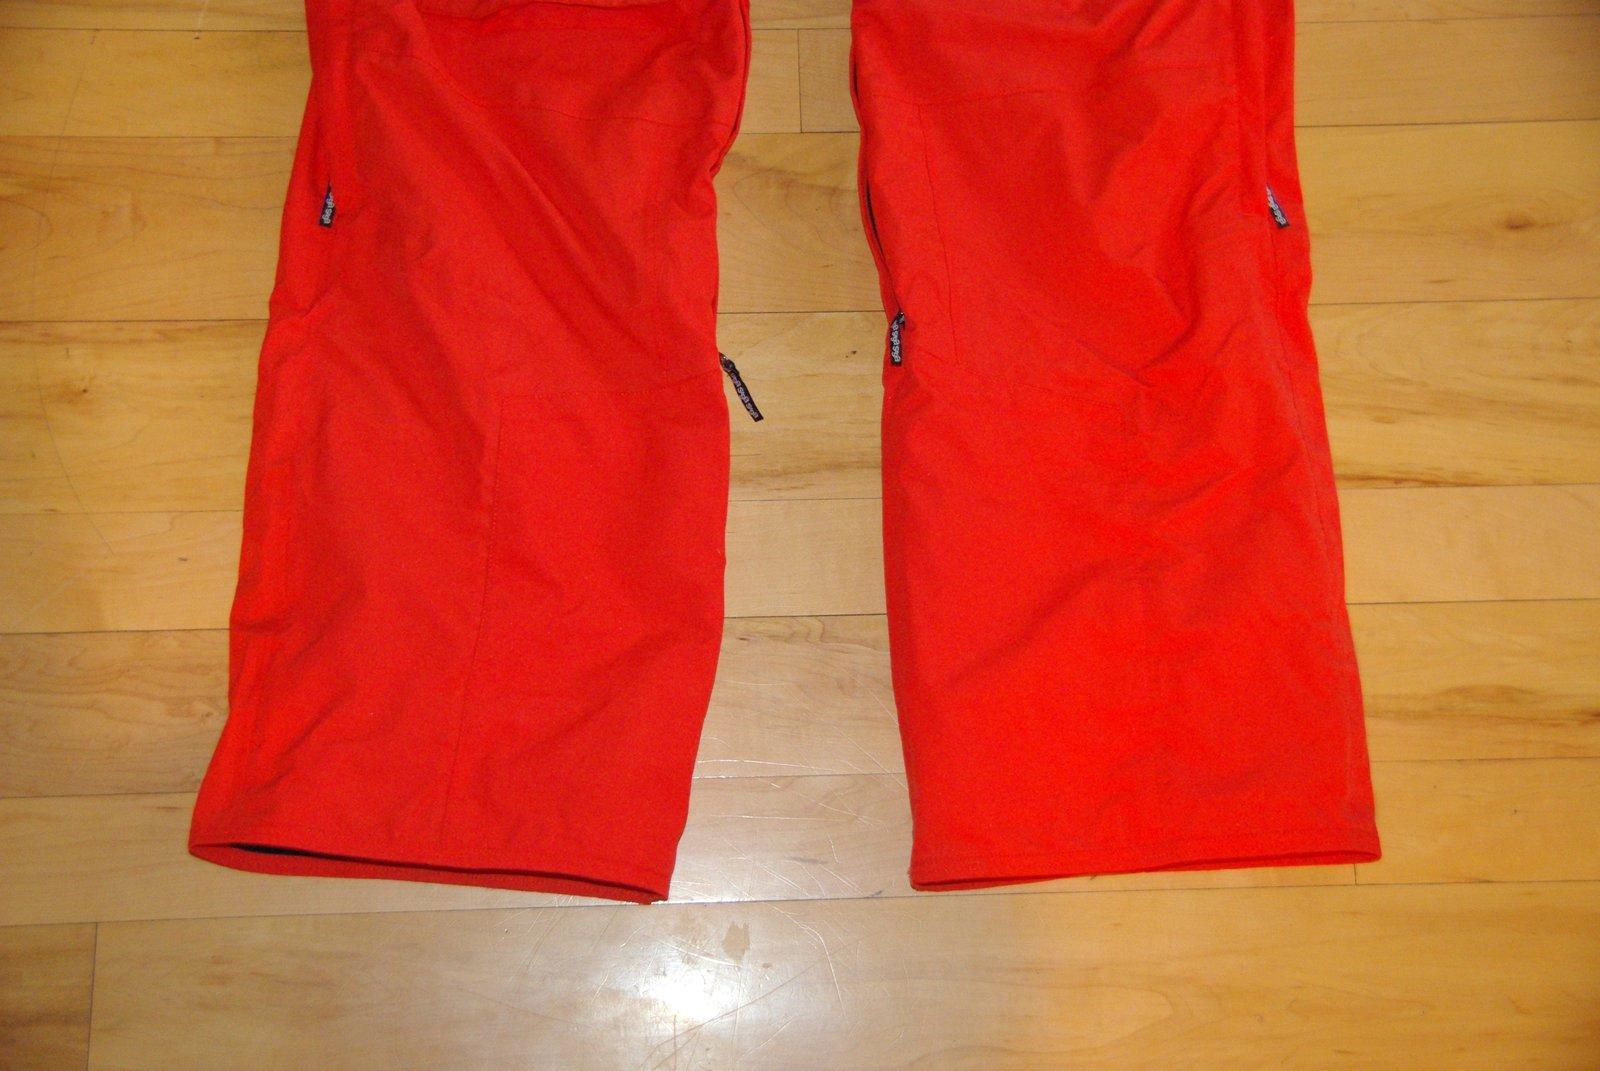 Saga - Tux jacket and lobster pant xl 4sale